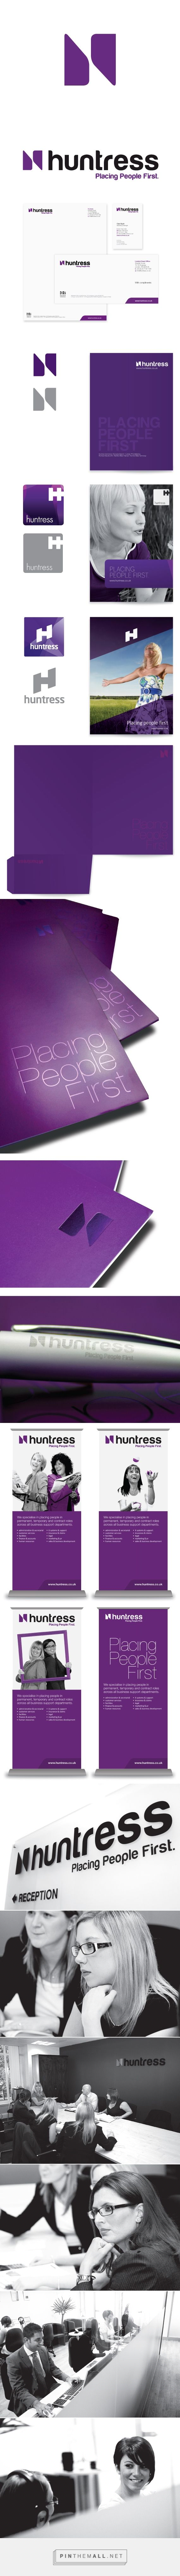 Huntress Group - Rebrand on Behance - created via https://pinthemall.net